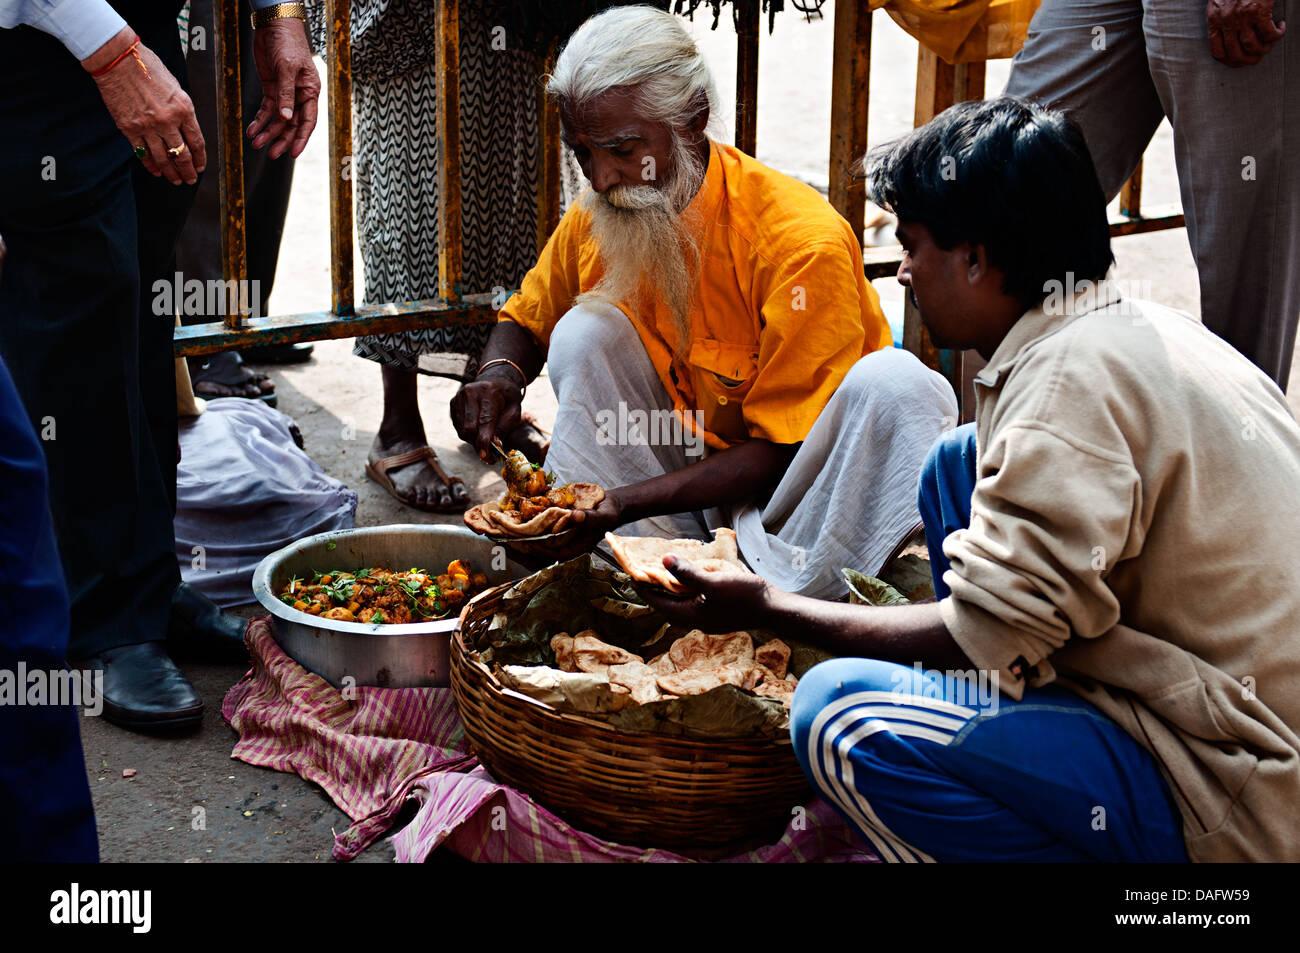 Food street stall in Kalighat area. Calcutta, Kolkata, West Bengal, India - Stock Image